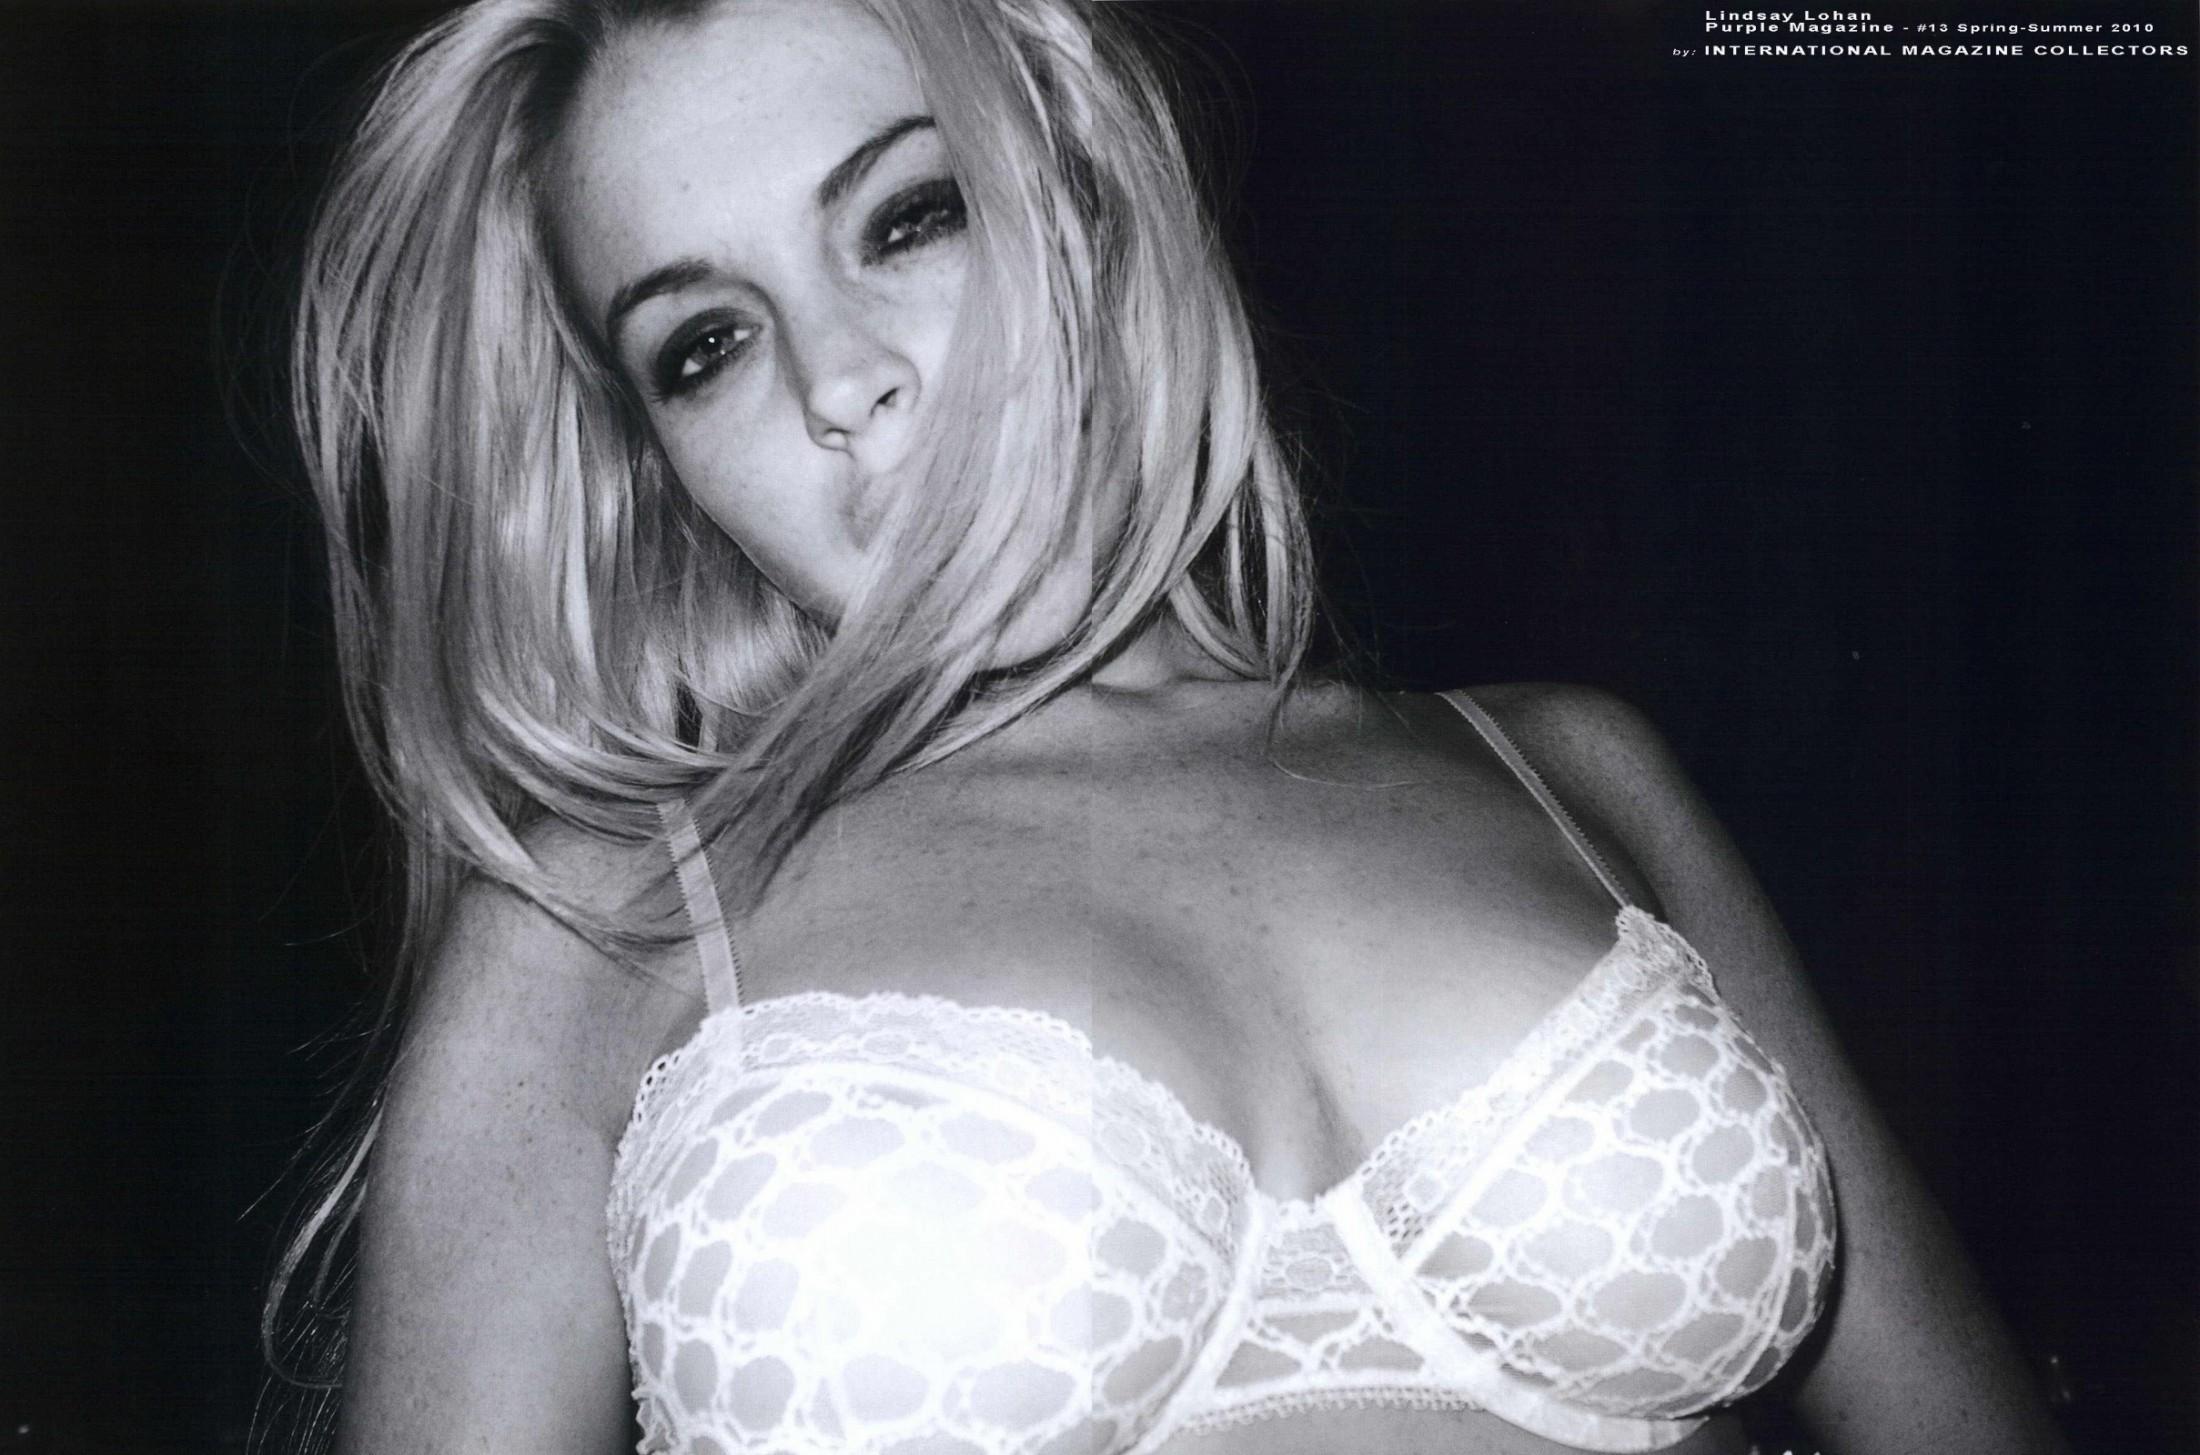 Lindsay Lohan 2010 : lindsay-lohan-in-purple-magazine-2010-07